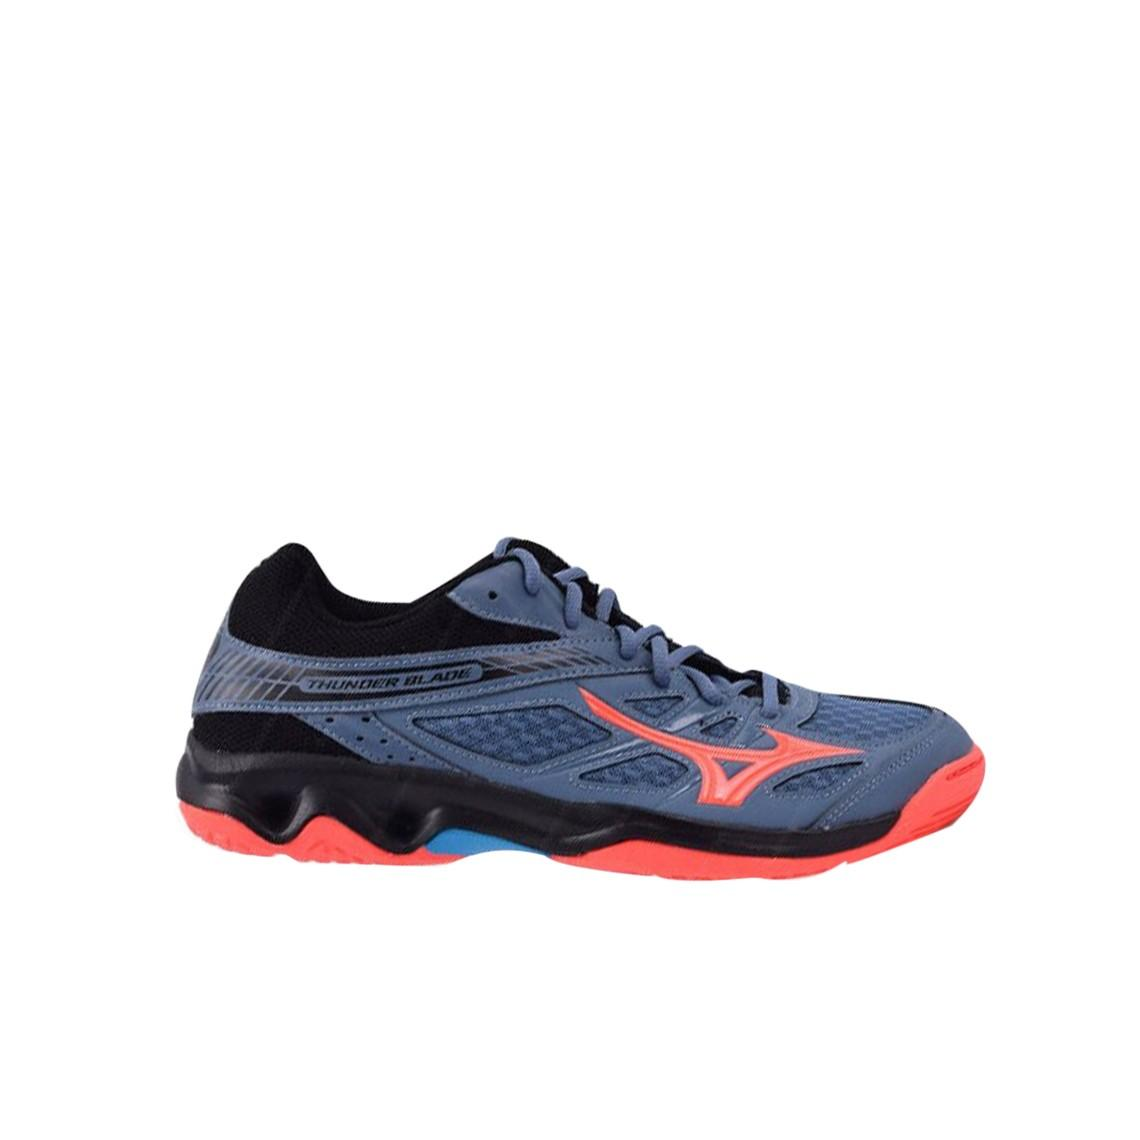 Kelebihan Sepatu Futsal Mizuno Original Basara 103 Sala Black Fiery Classic 2 In Yellow Voli V1ga177065 Thunder Blade Blue Mirage Coral